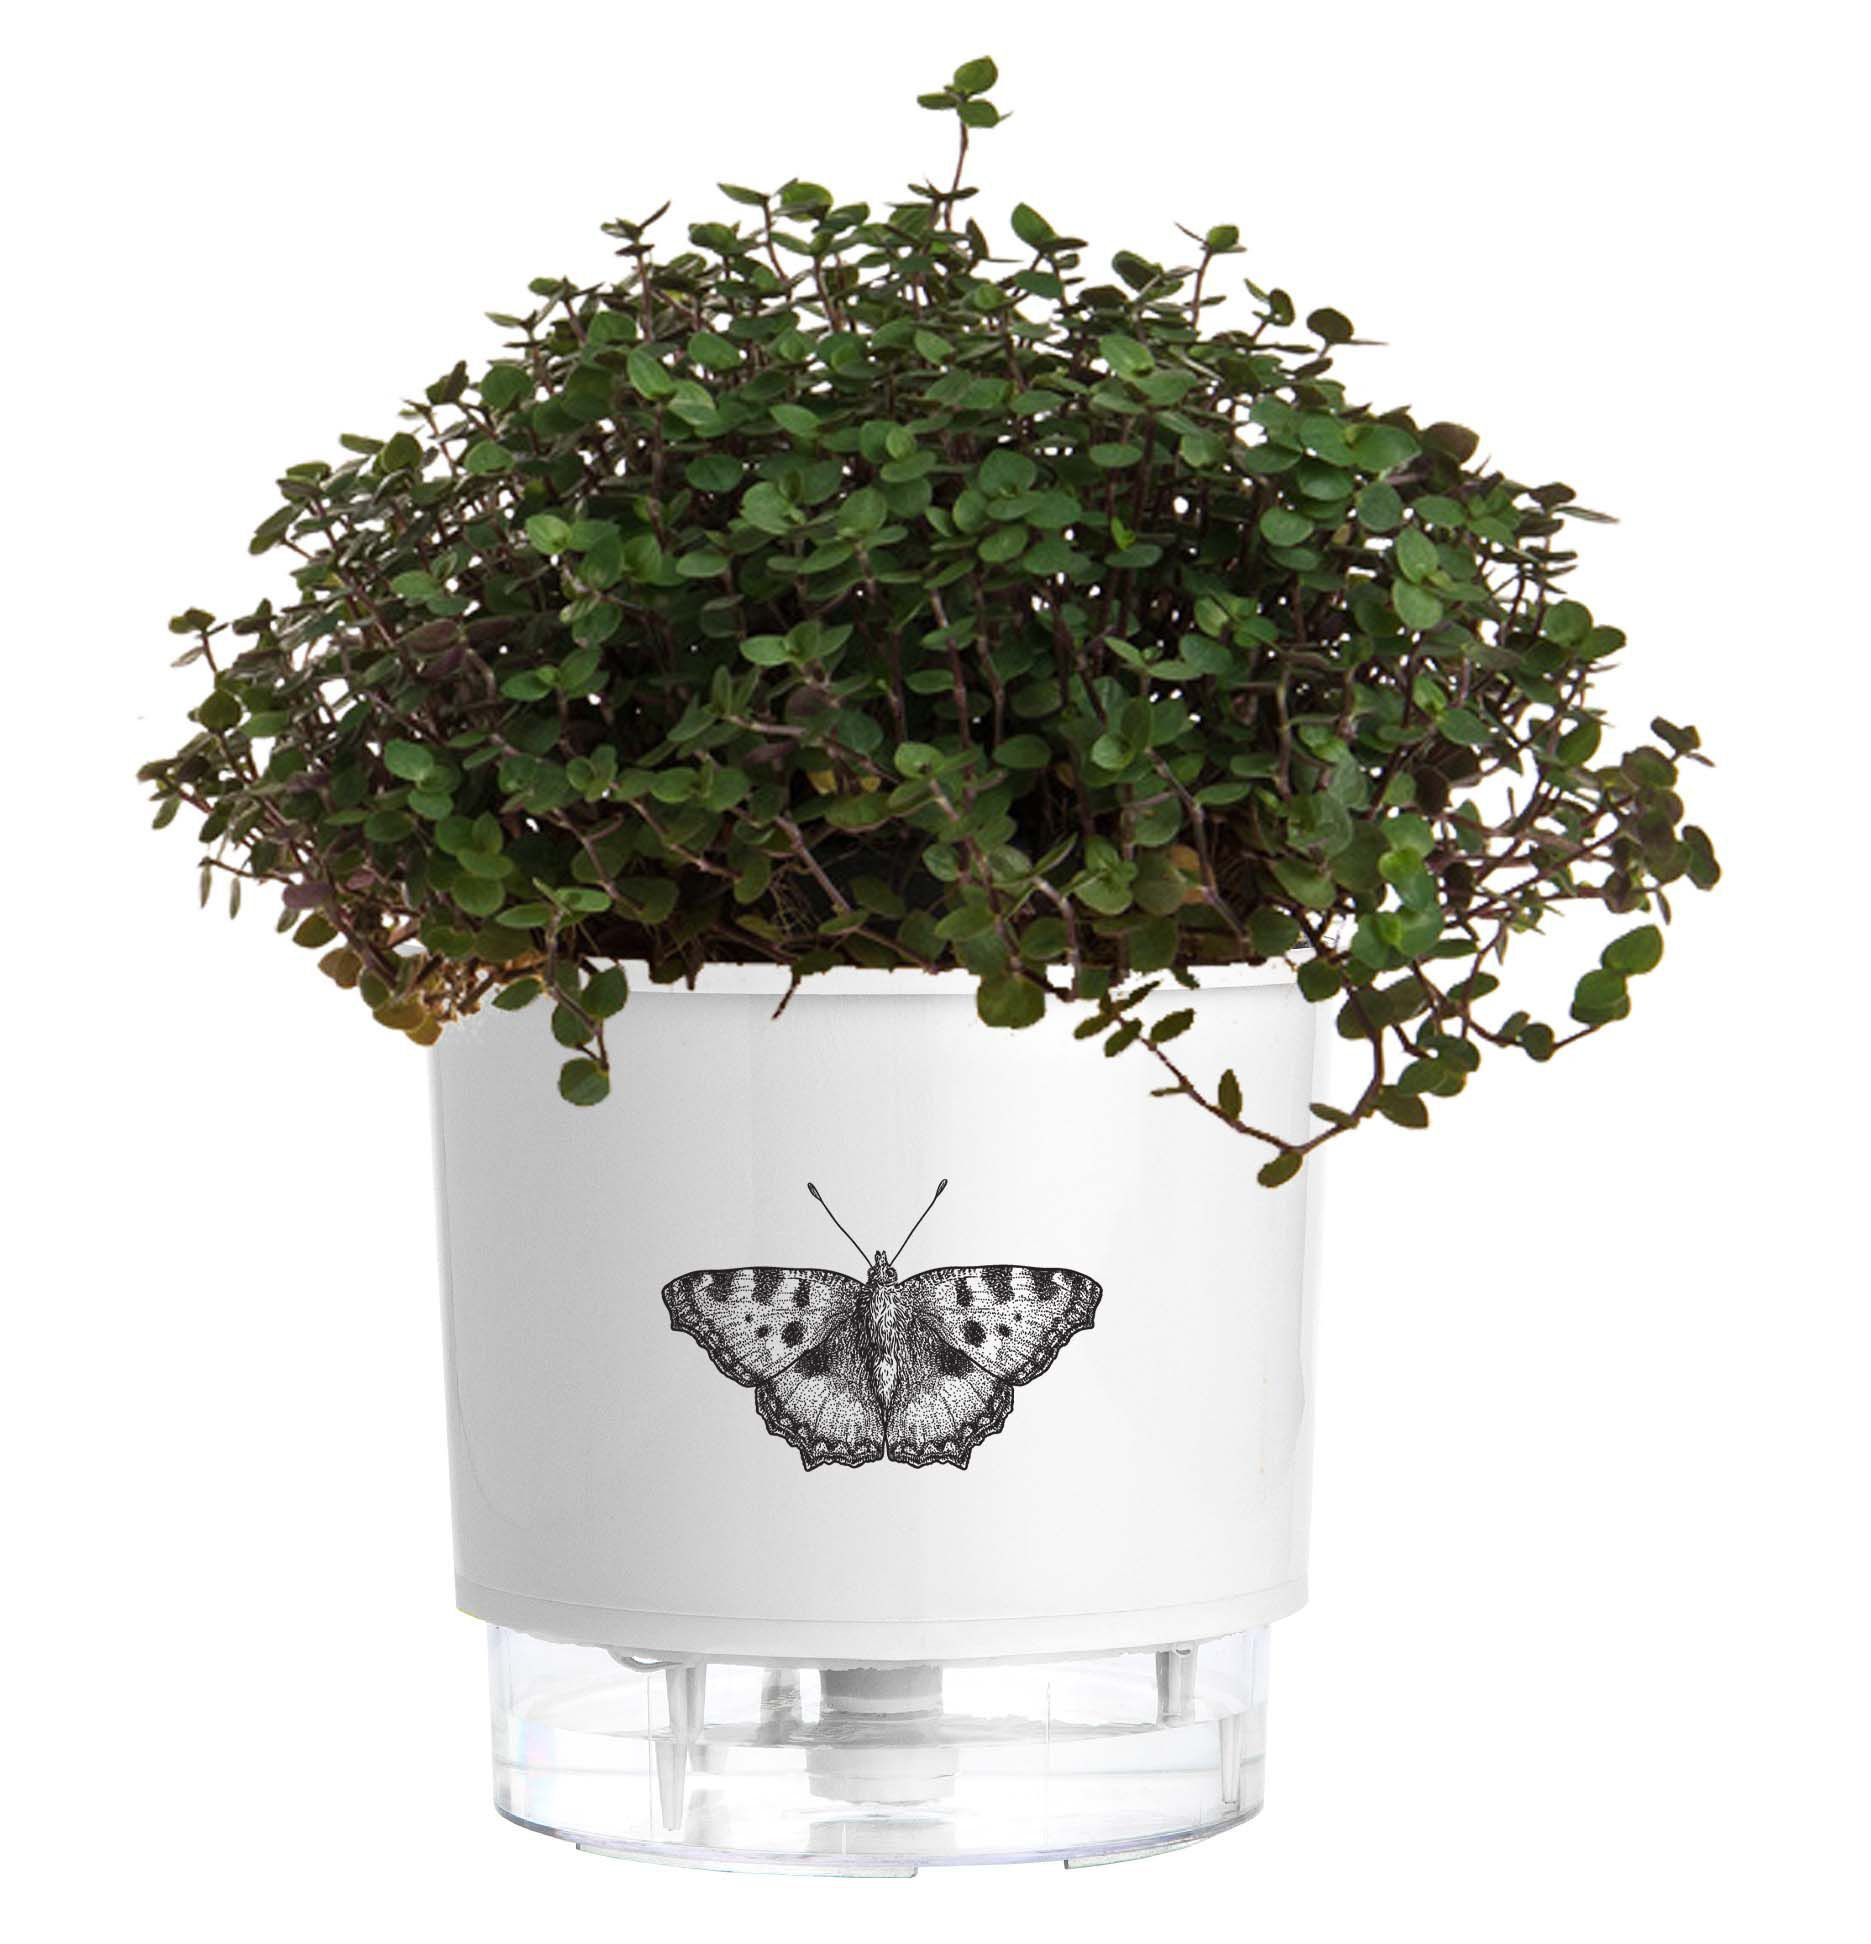 Vaso Autoirrigável Pequeno Branco Borboleta Linha Jardim de Insetos - Raiz